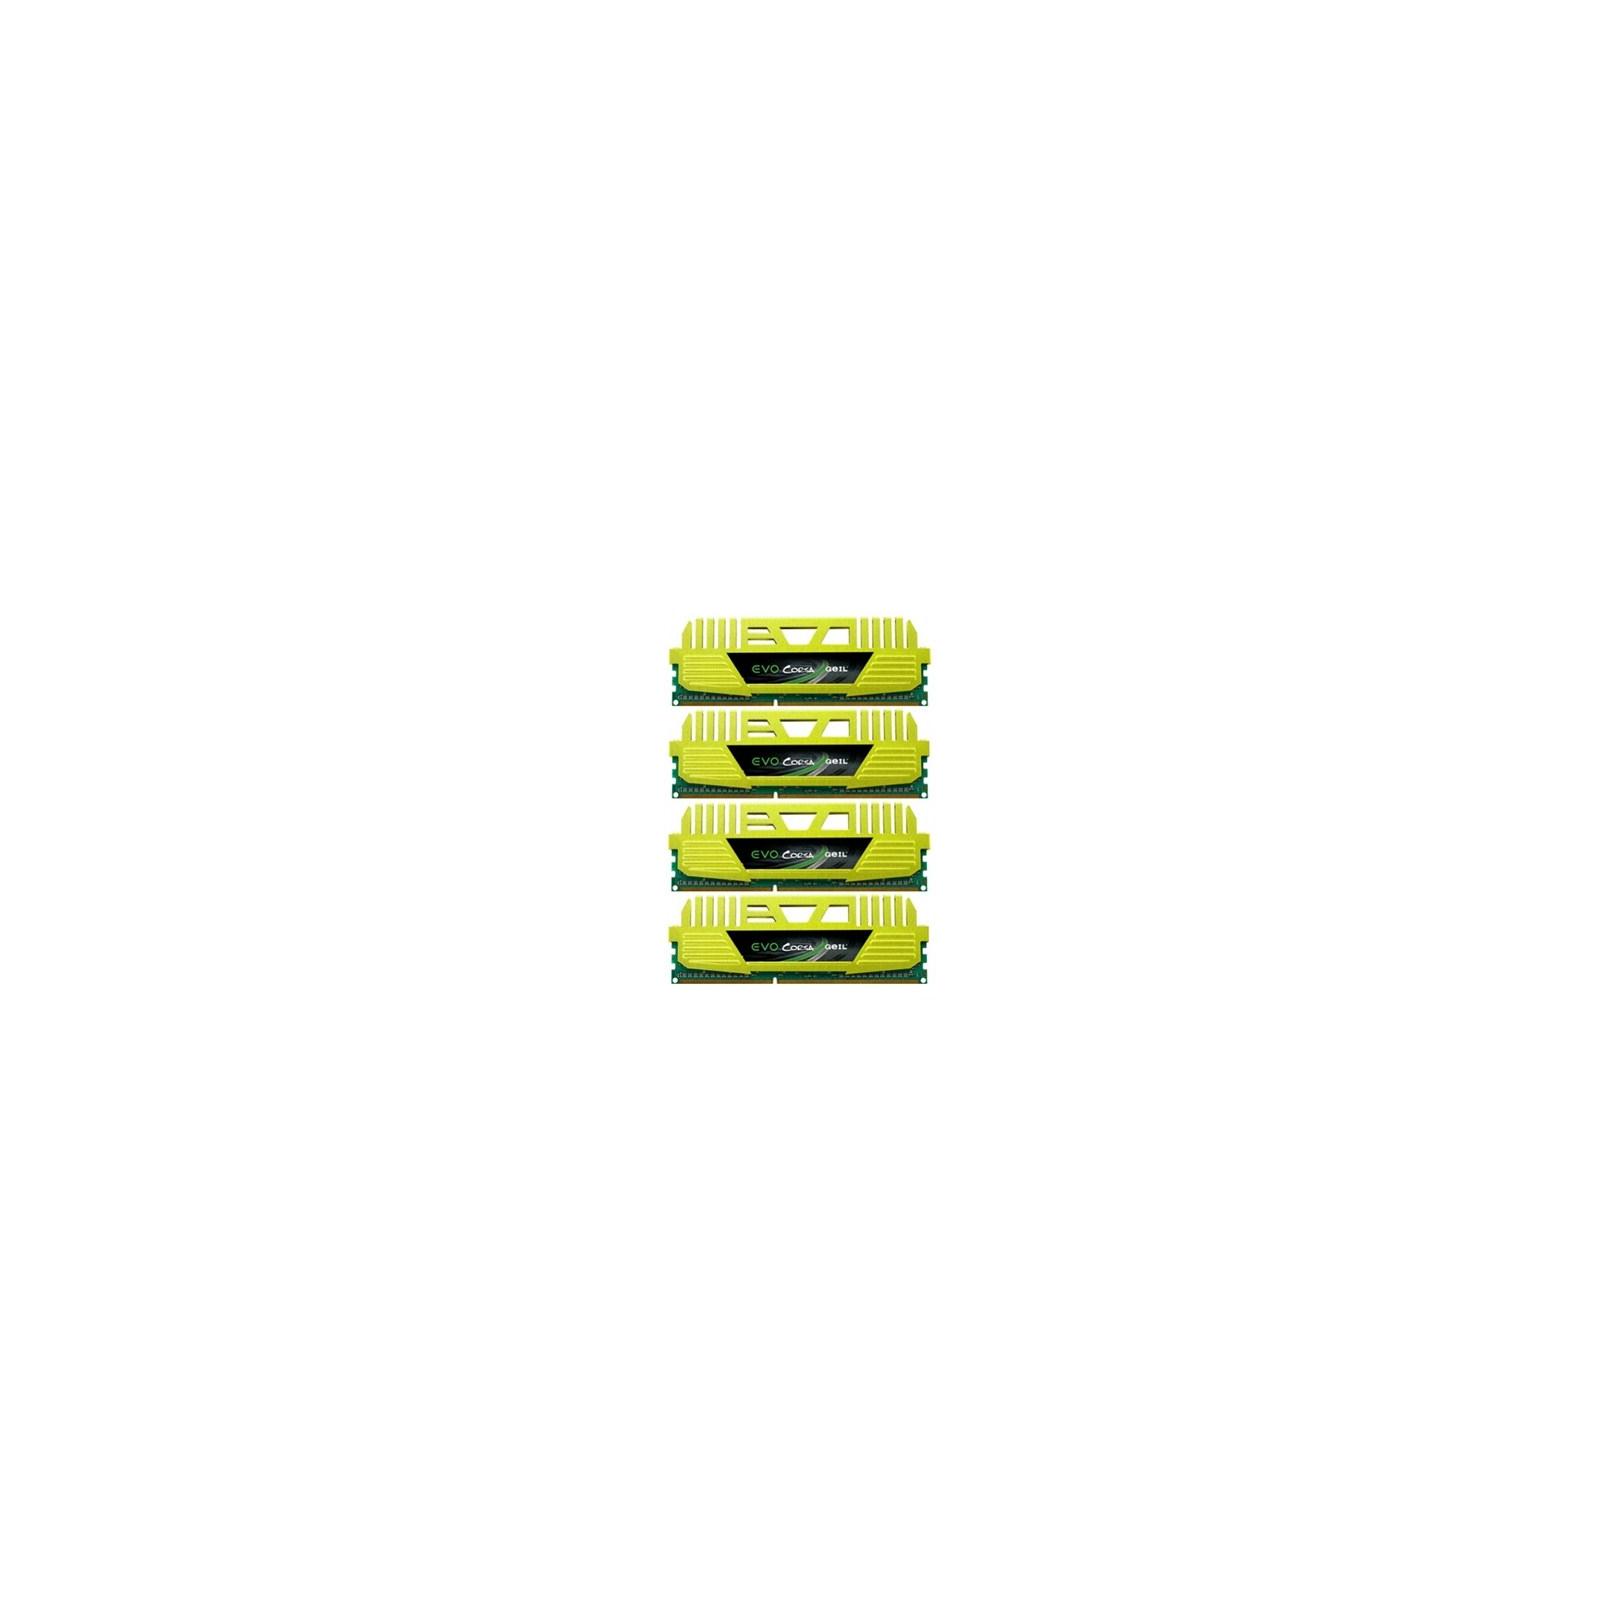 Модуль памяти для компьютера DDR3 32GB (4x8GB) 1600 MHz GEIL (GOC332GB1600C10QC)